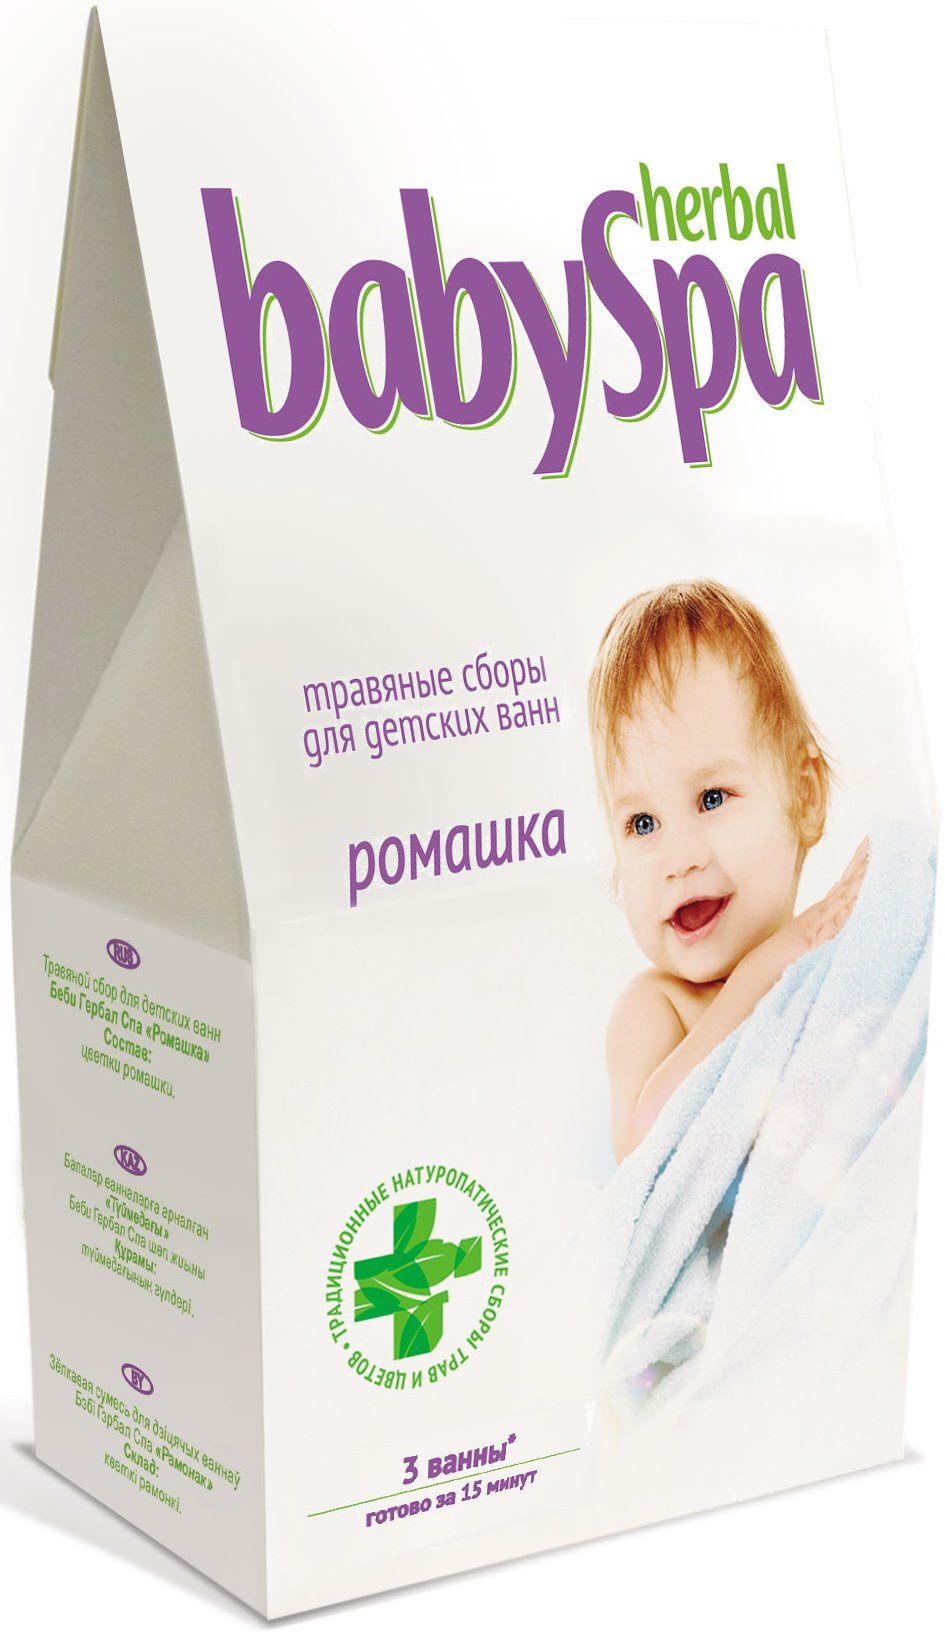 Herbal Baby Spa Травяной сбор Ромашка, 45 г травяной сбор лапчатка белая корень сила природы 25 г